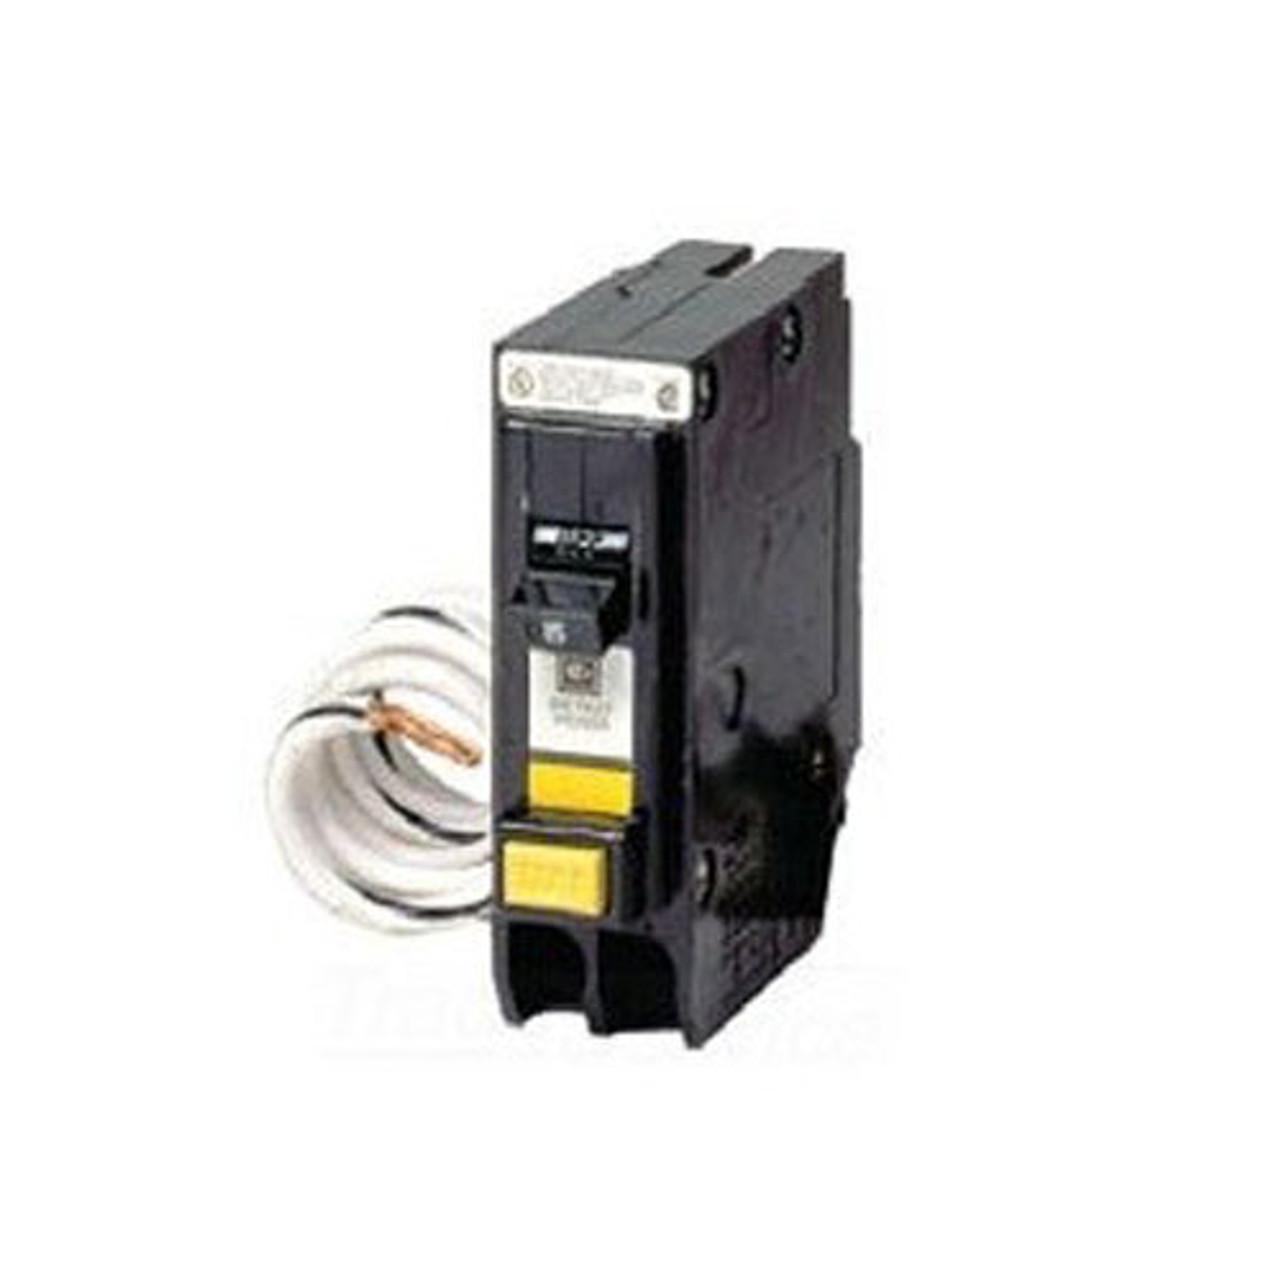 10 x   Breaker Eaton Cutler-Hammer Combination AFCI 20 Amp BRCAF120 New